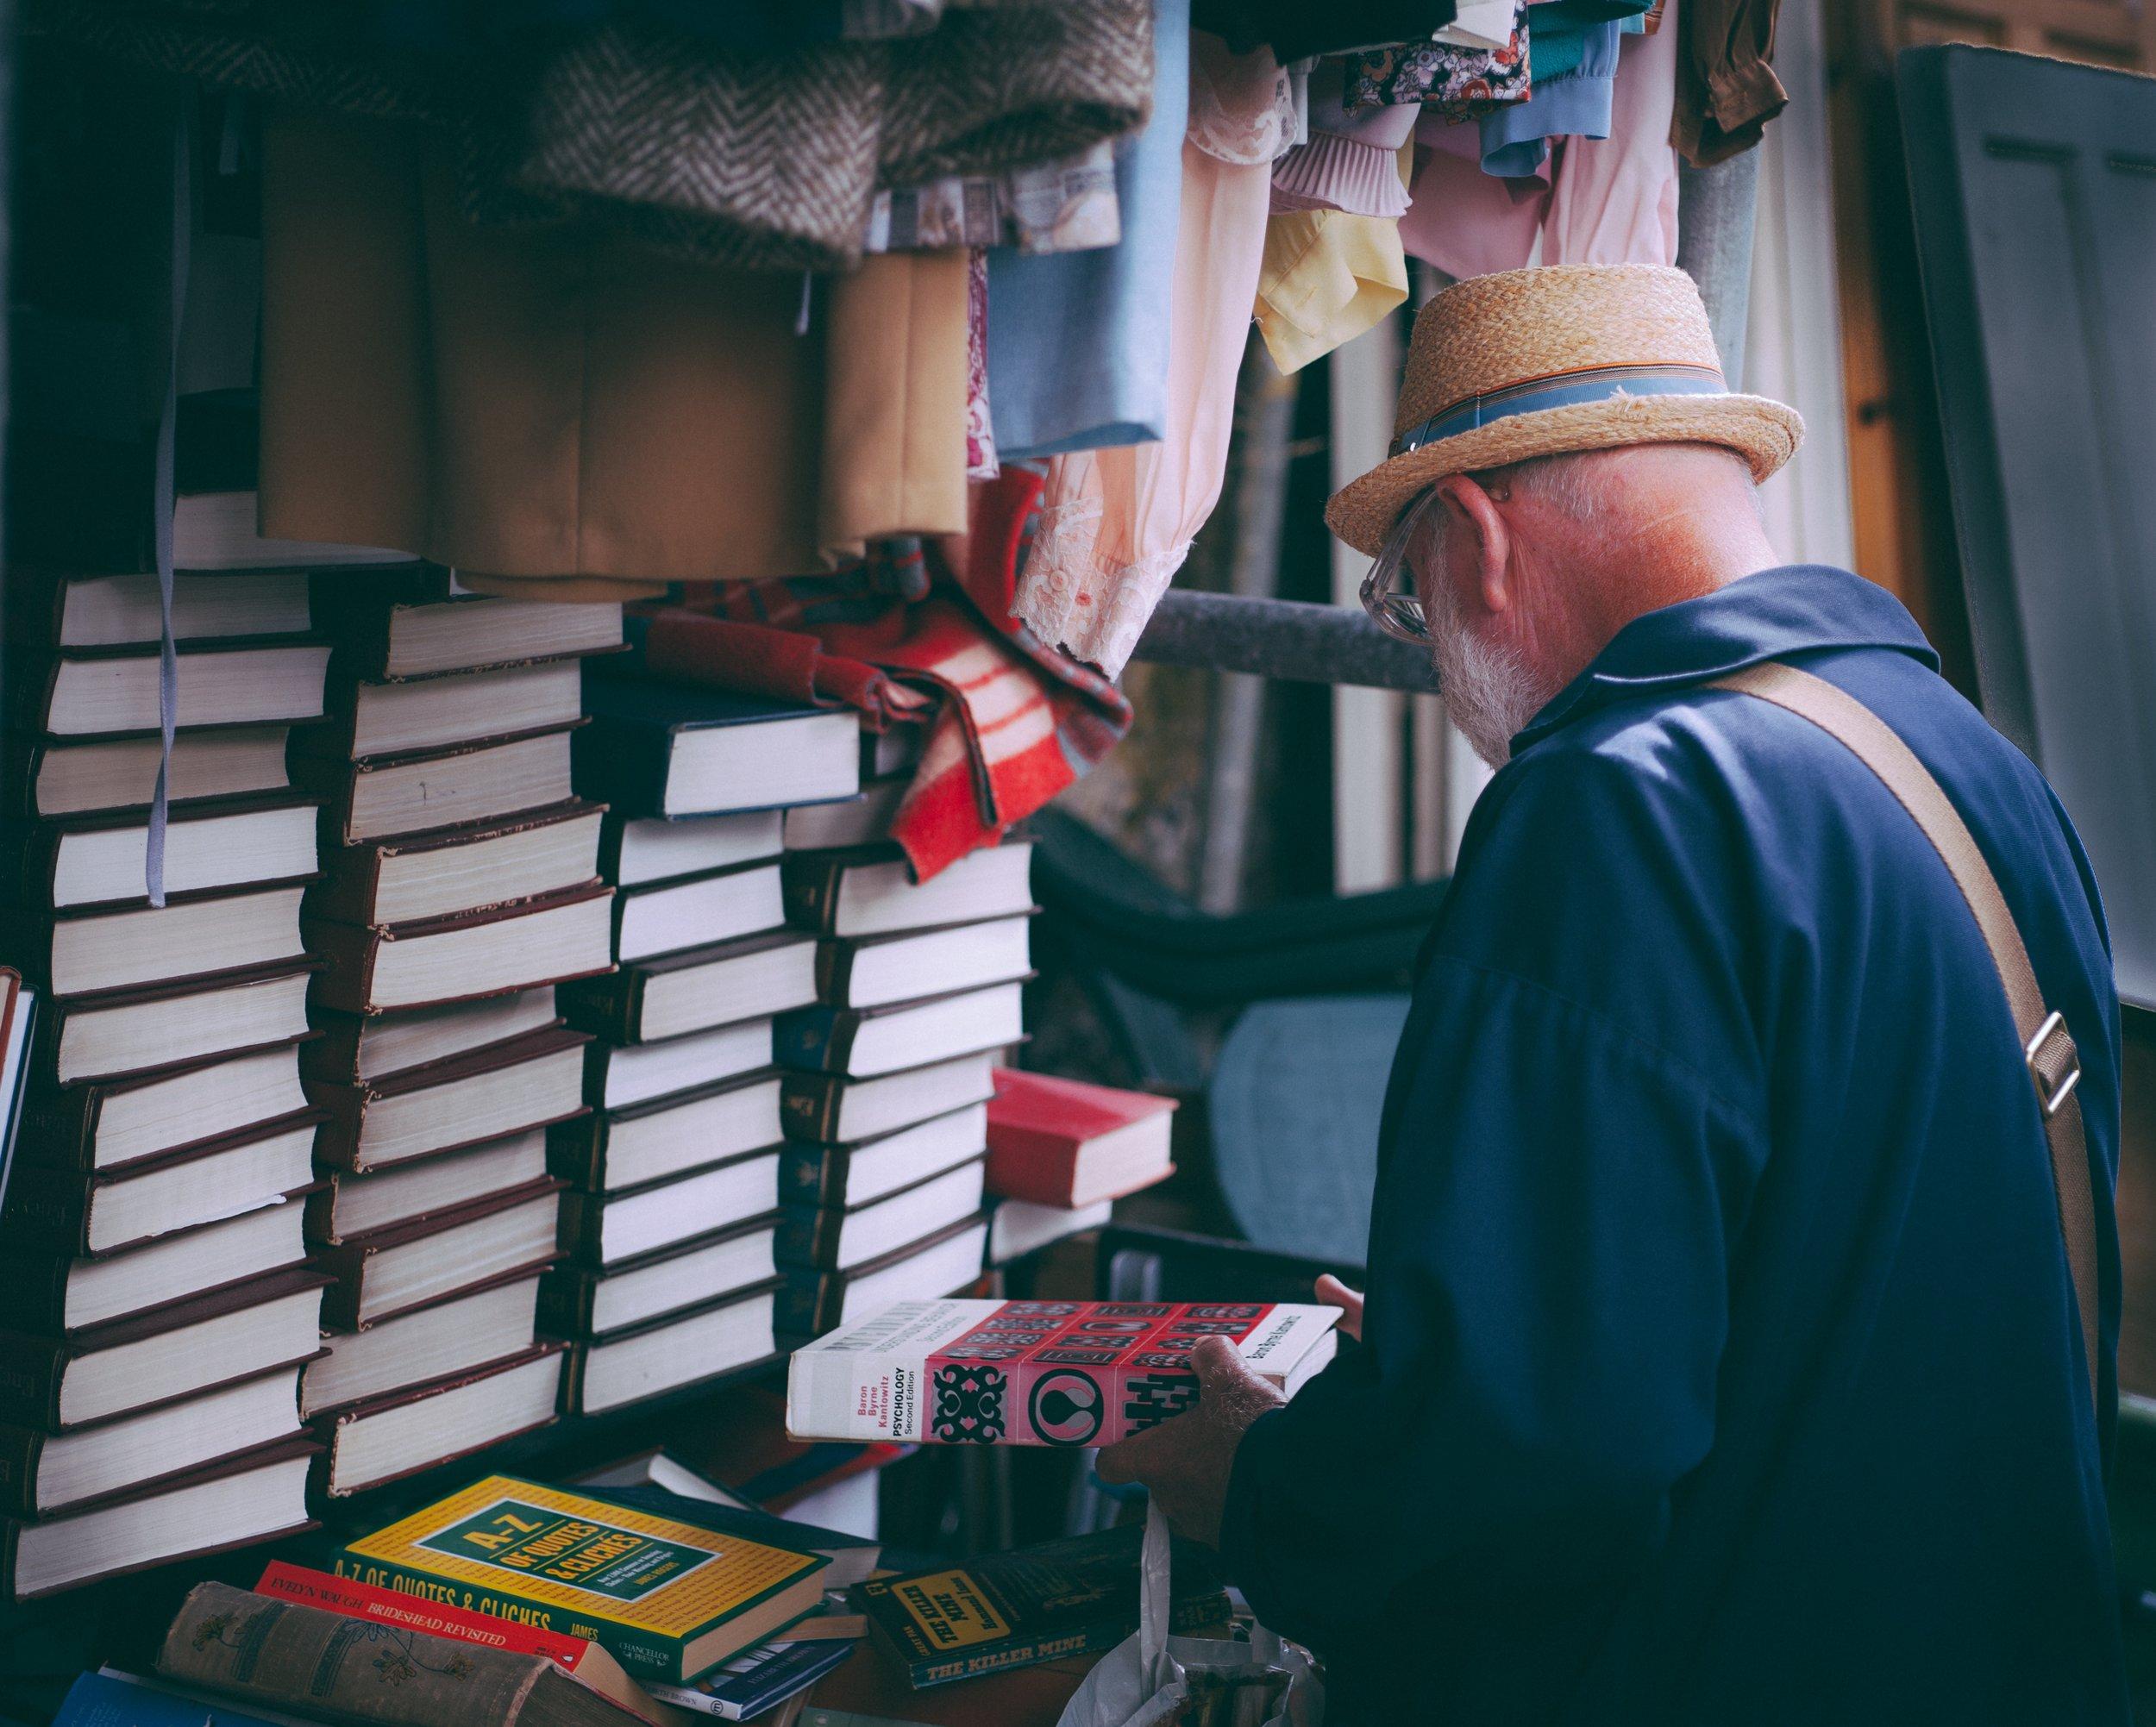 man-book-color-hat-market-elderly-152930-pxhere.com.jpg